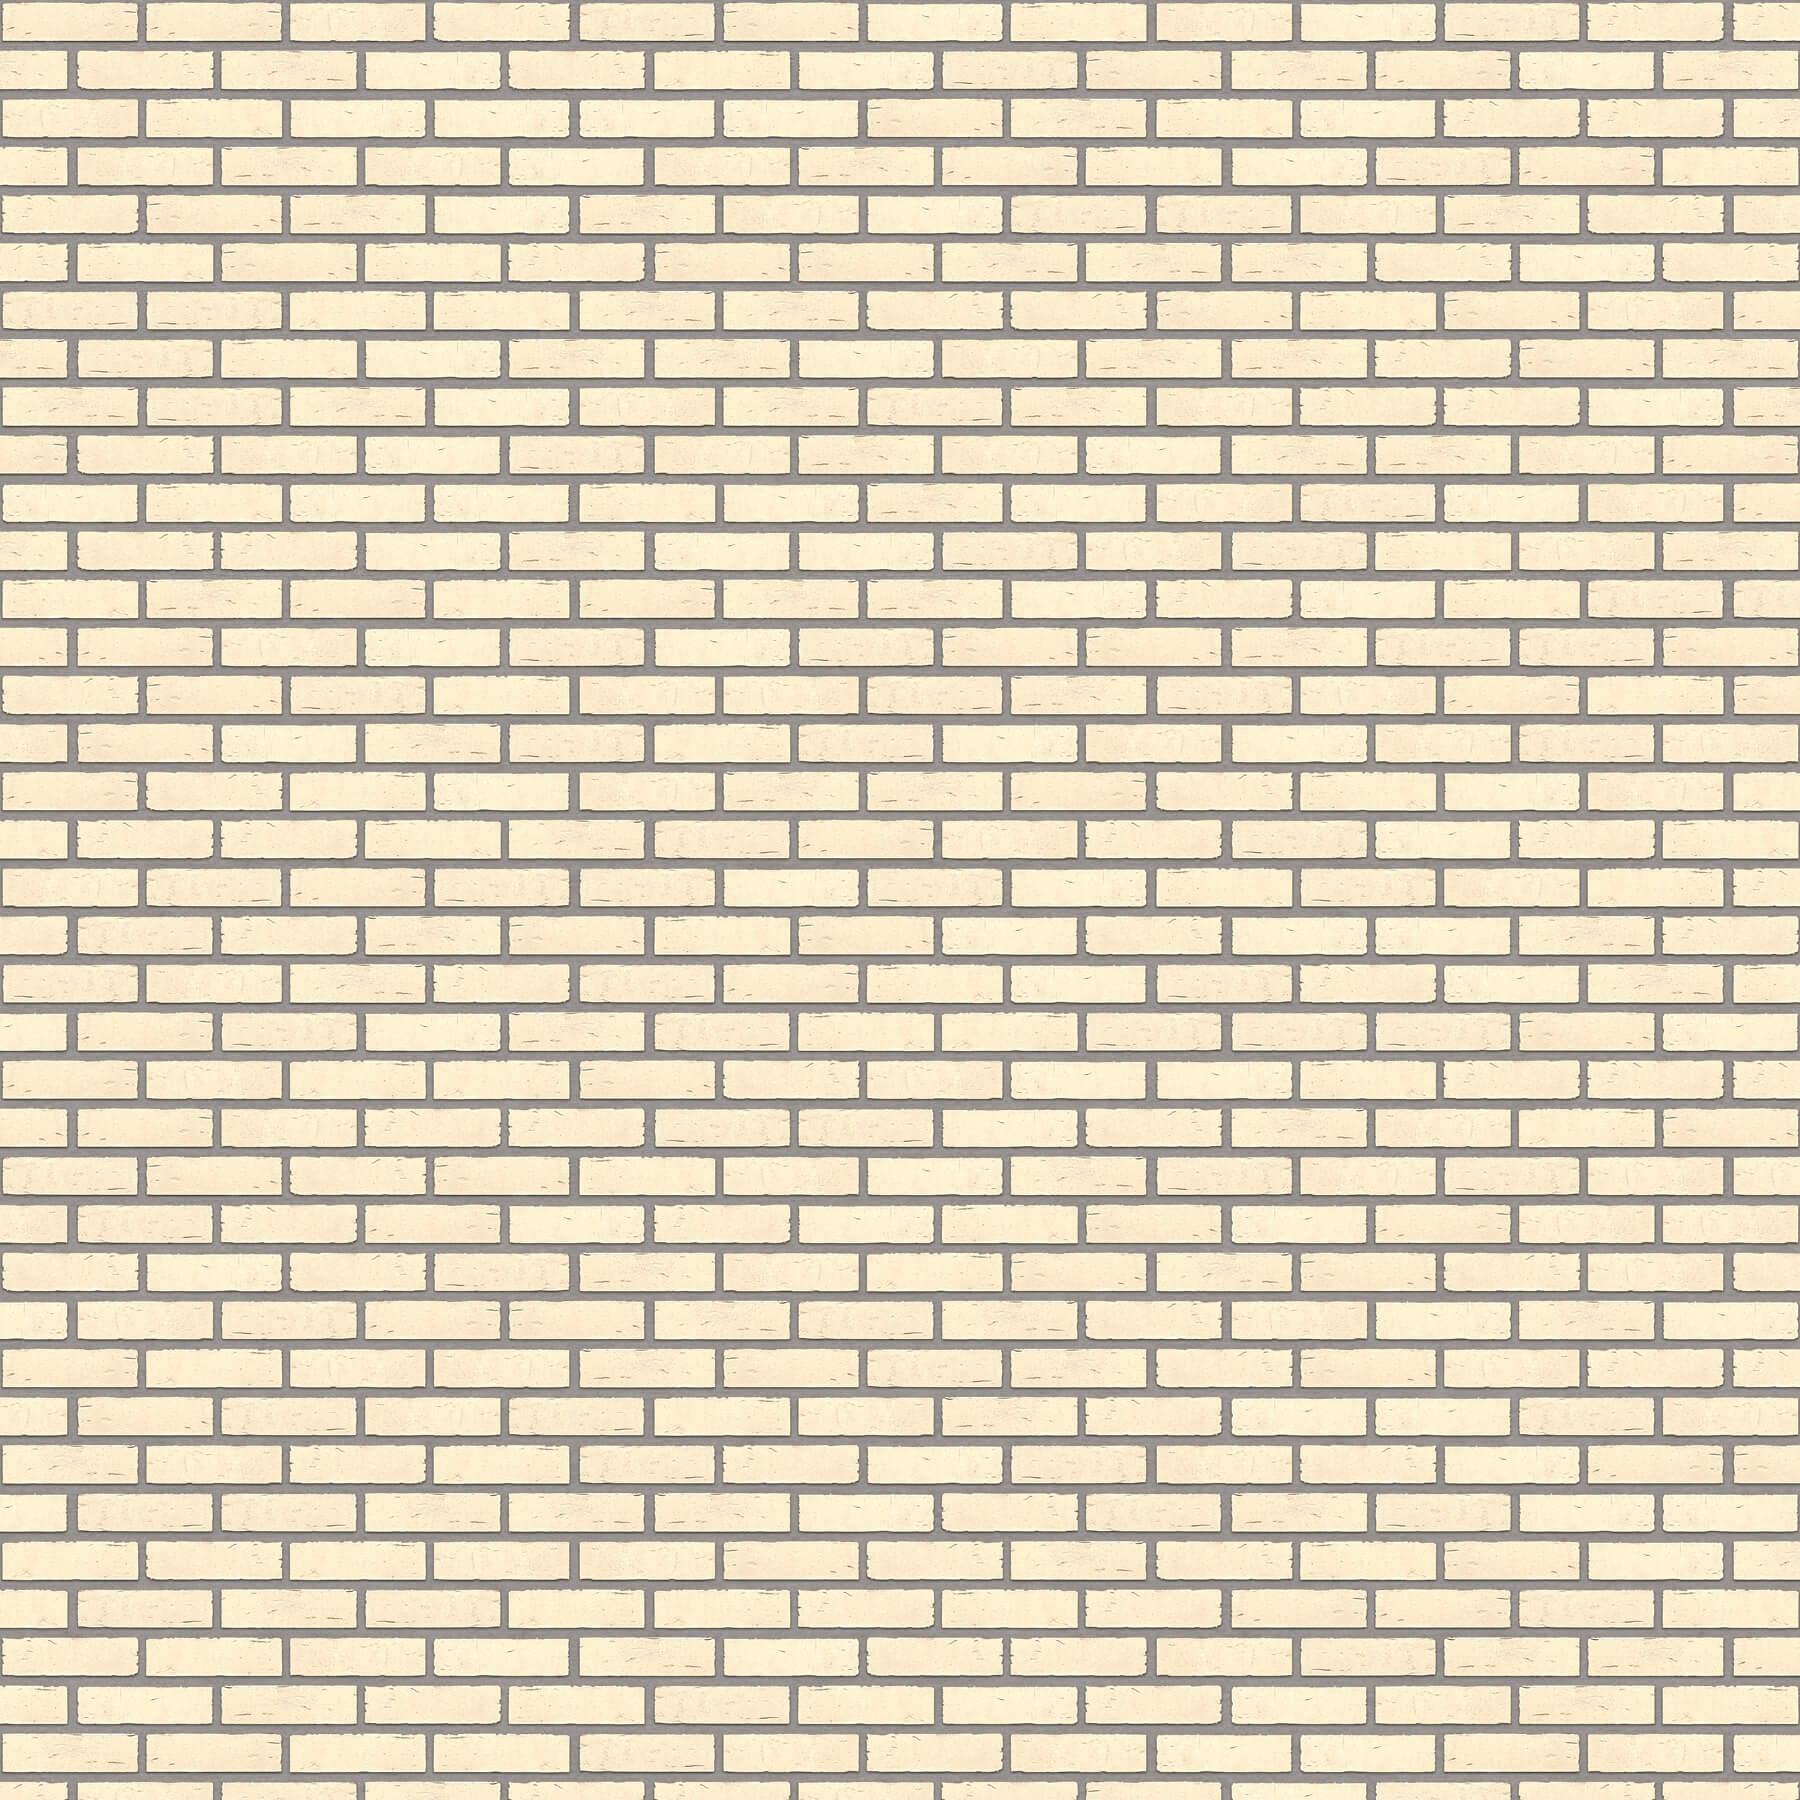 Dekorativna cigla listela FeldHaus Klinker r-763 nf Siva